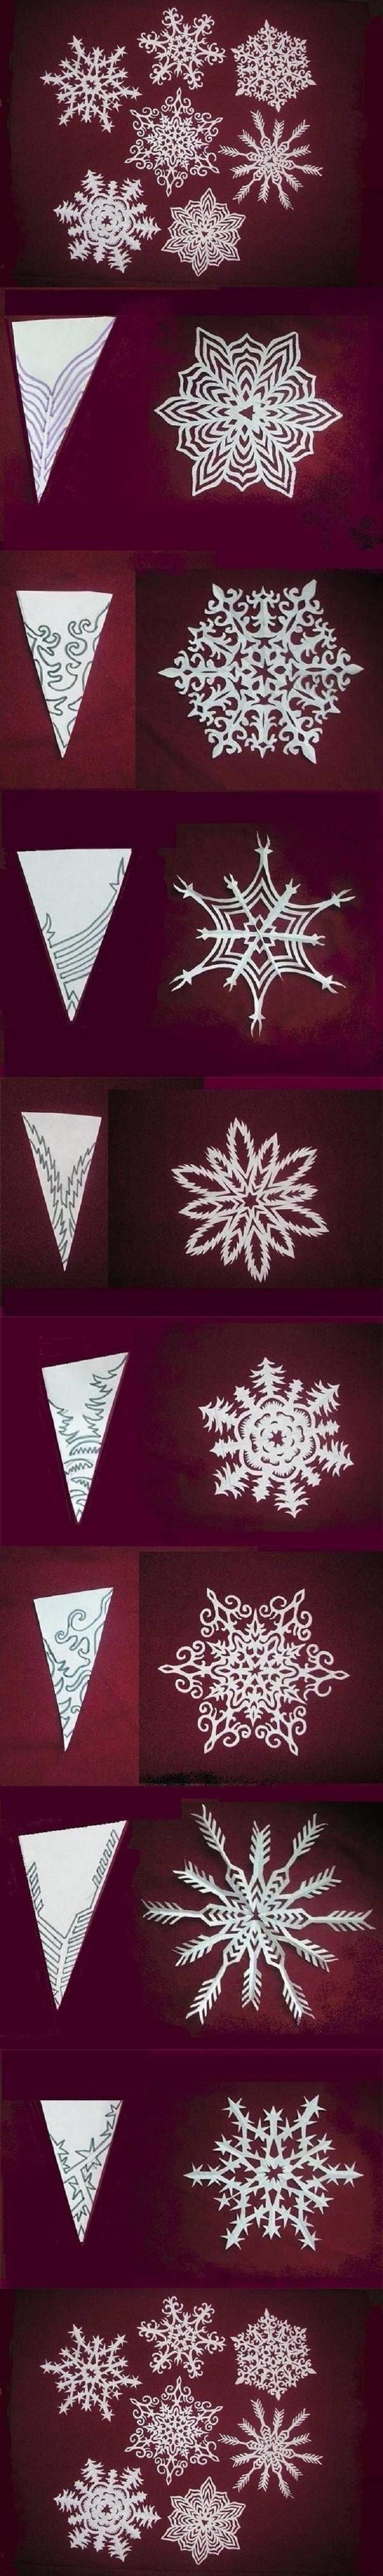 DIY Paper Snowflakes - 15 Most PINteresting DIY Paper Decorations | GleamItUp